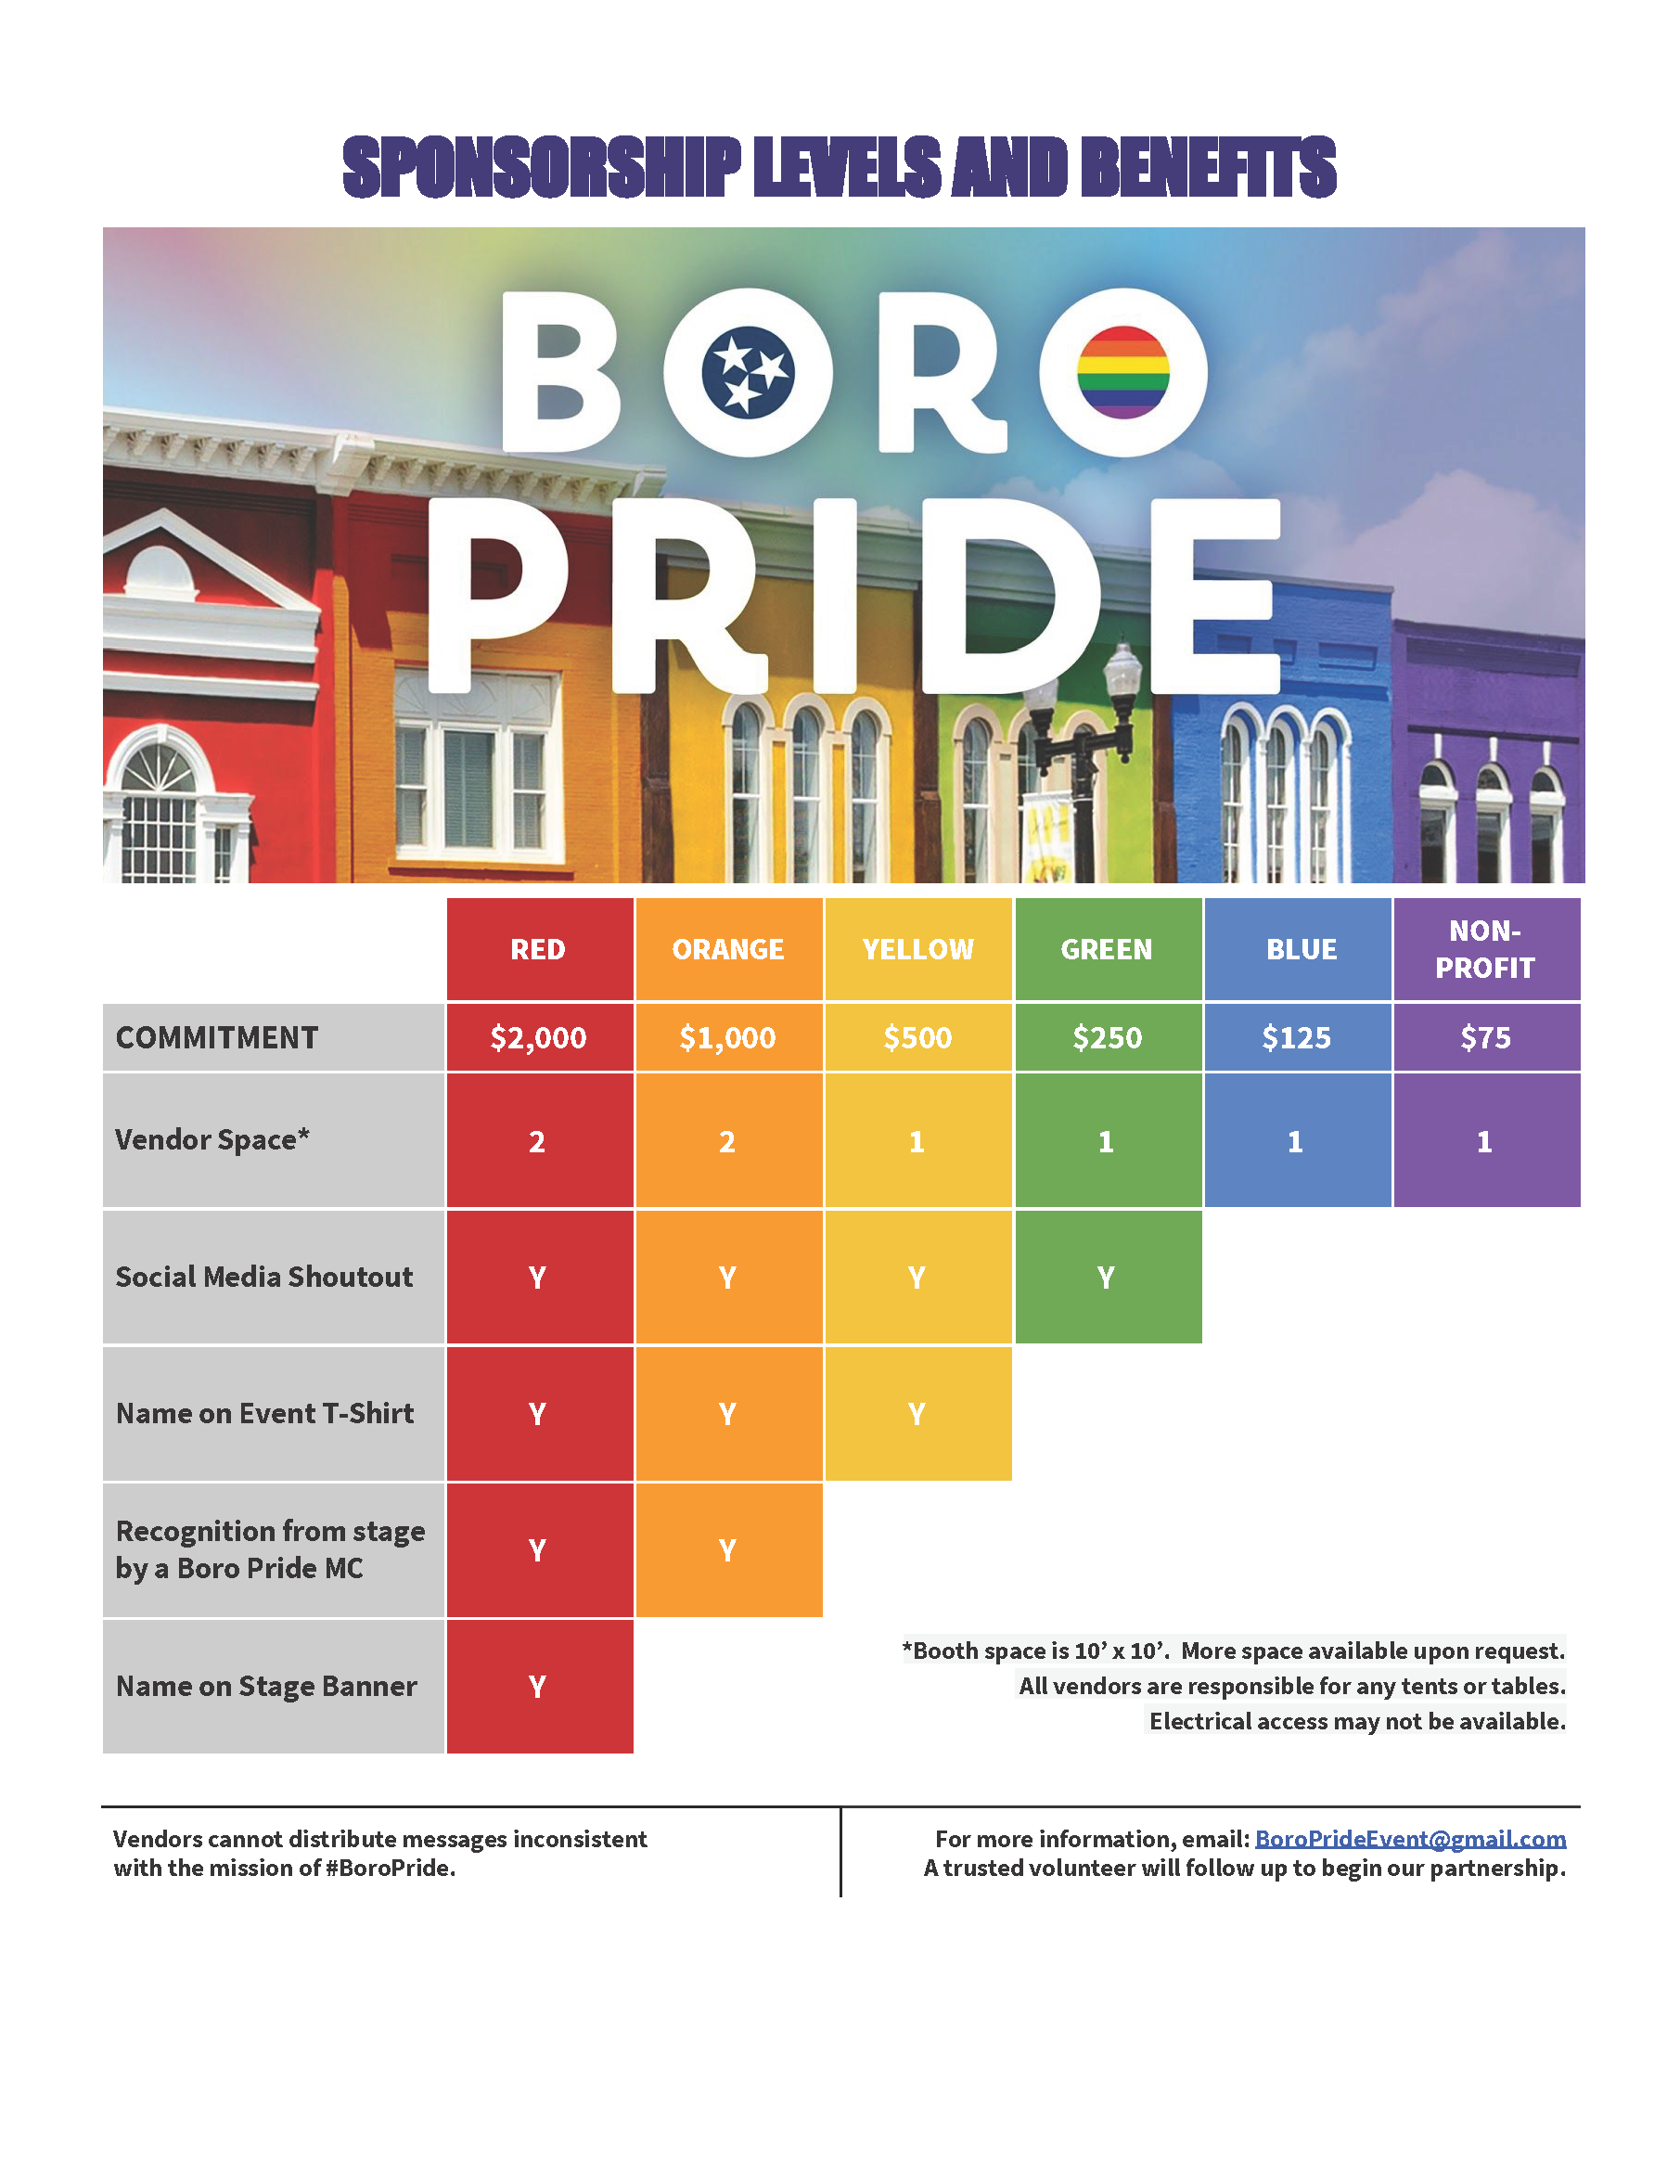 2020_Boro_Pride_Sponsorship_LevelsRevised.png